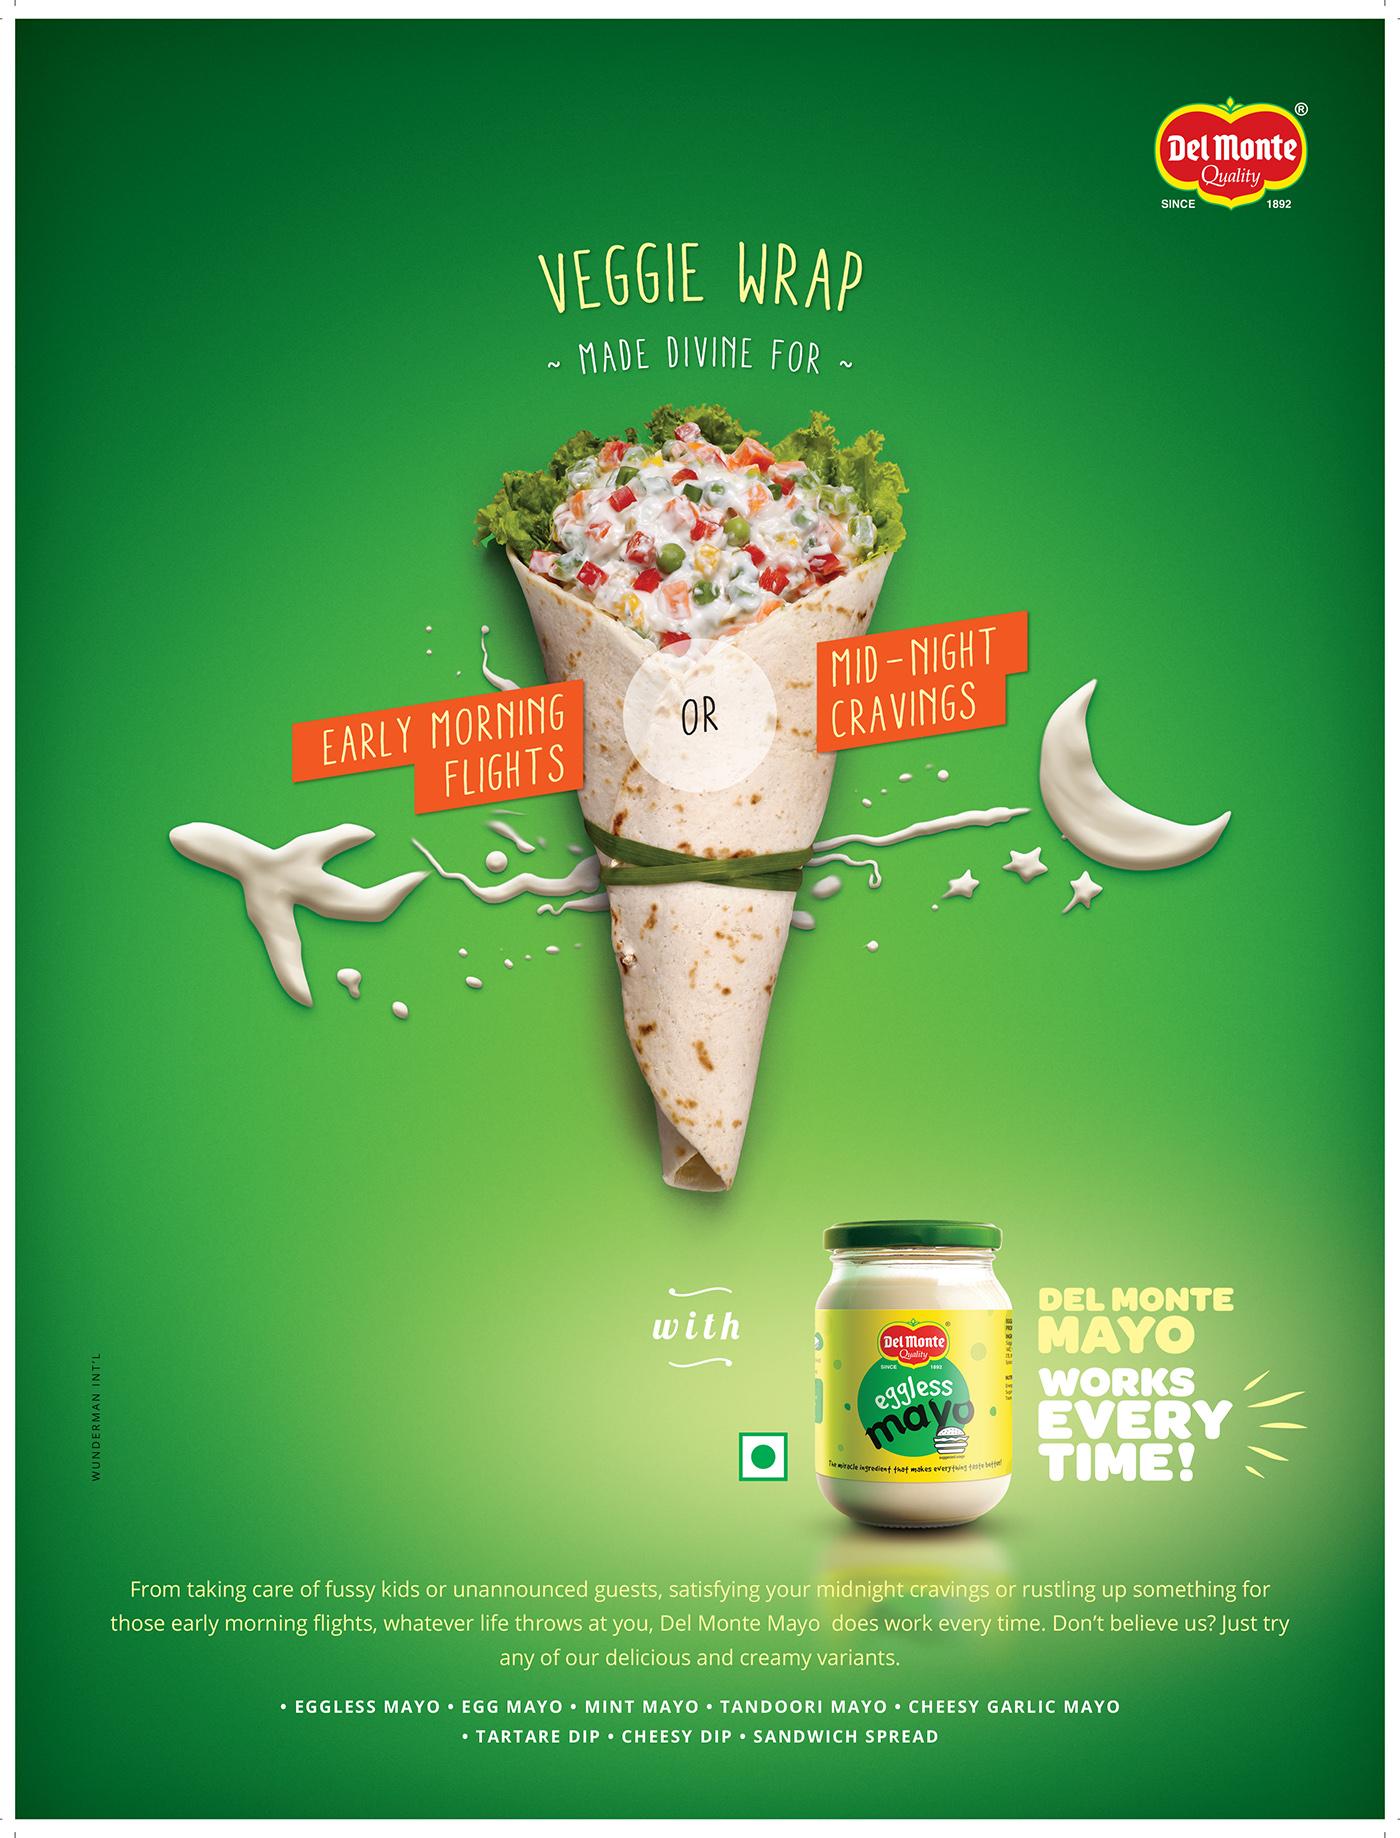 veggieWrap_htBrunch_22-60x29-70